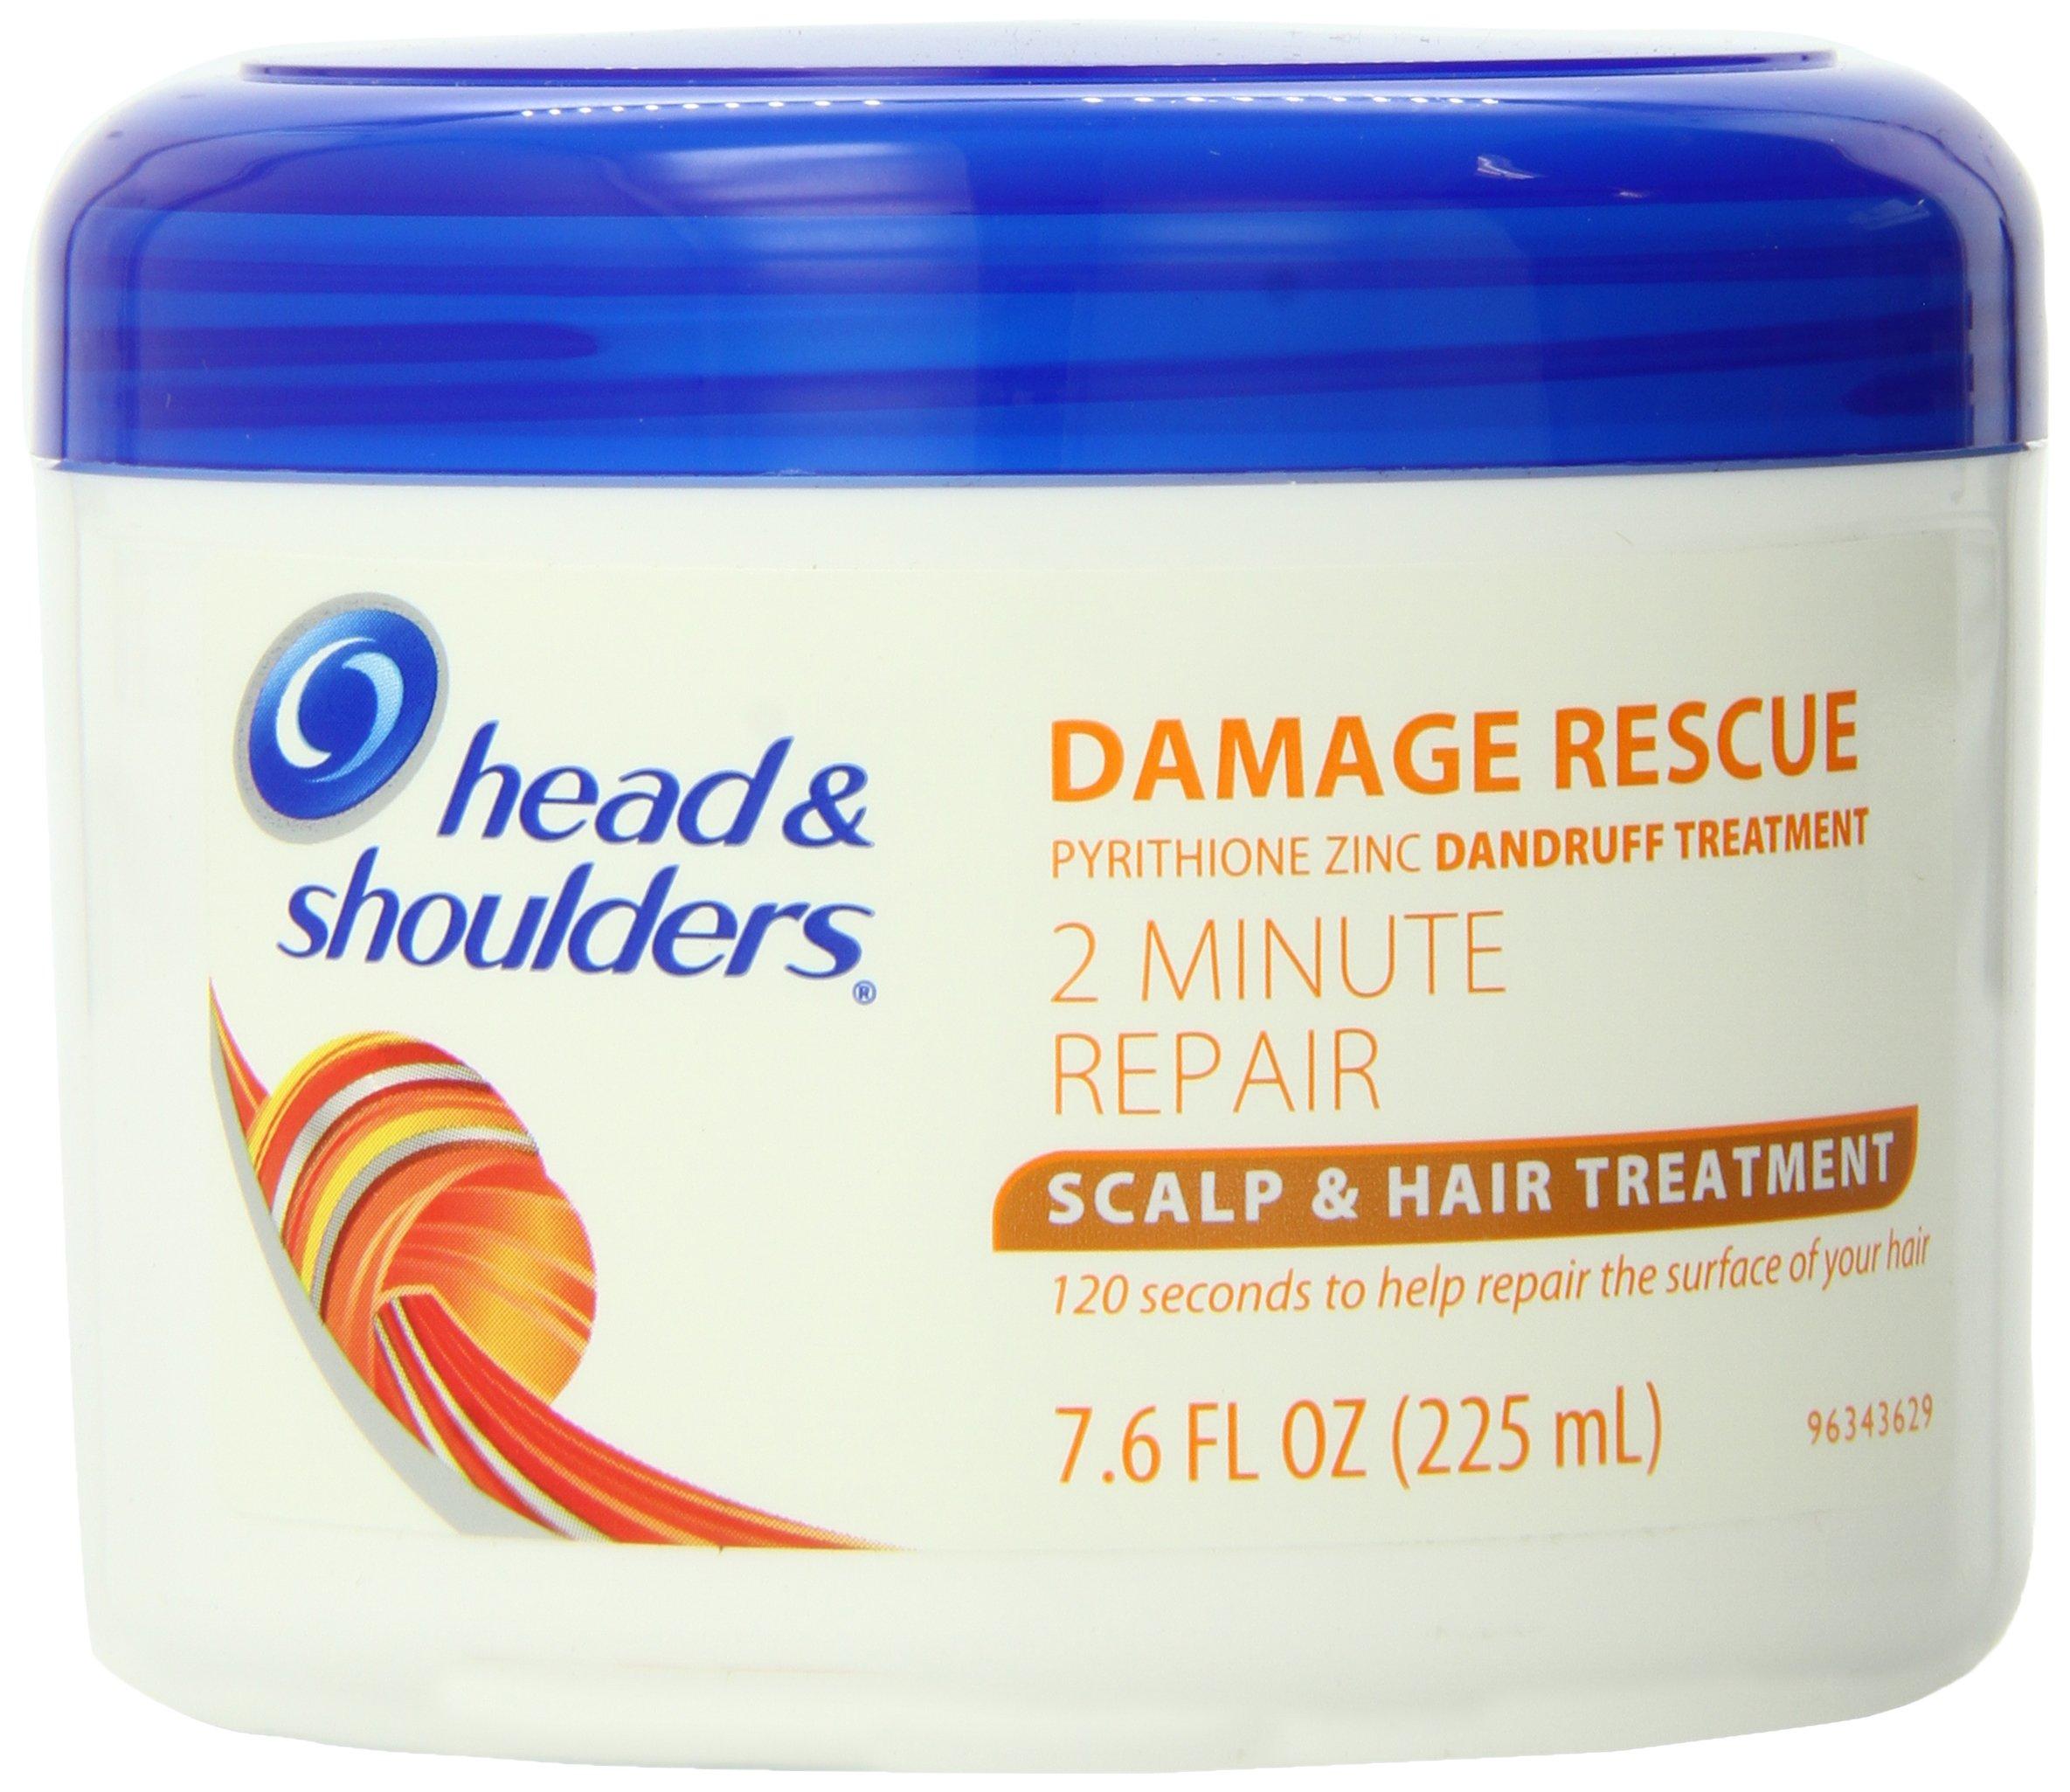 Head and Shoulders Damage Rescue 2 Minute Repair Scalp & Hair Treatment 7.6 Fl Oz